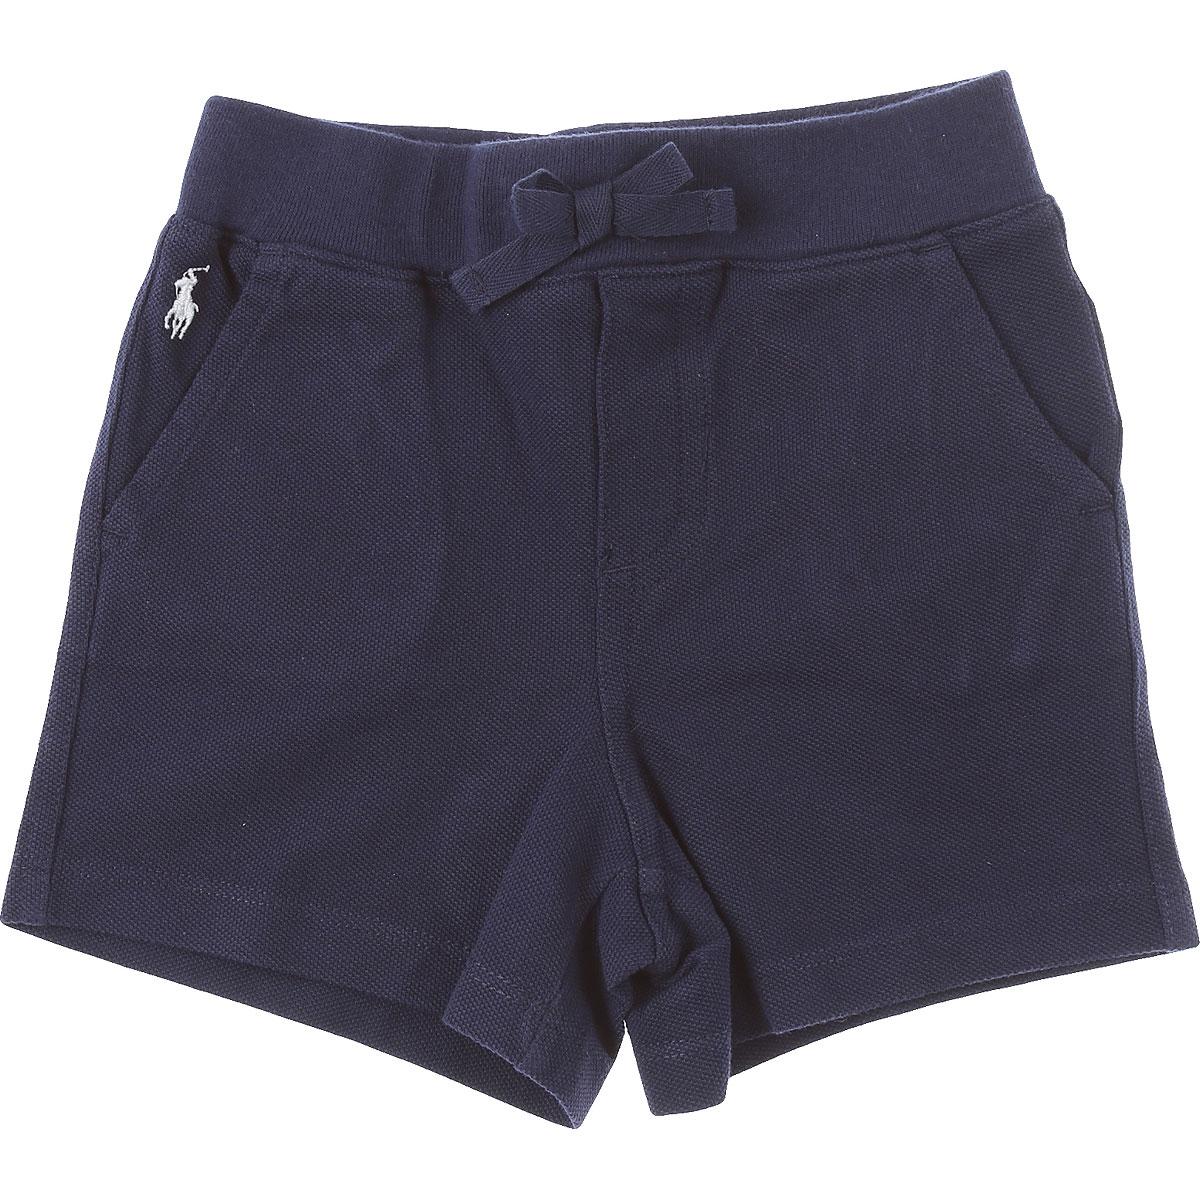 Ralph Lauren Baby Shorts for Boys On Sale, nav, Cotton, 2019, 18 M 2Y 6M 9 M